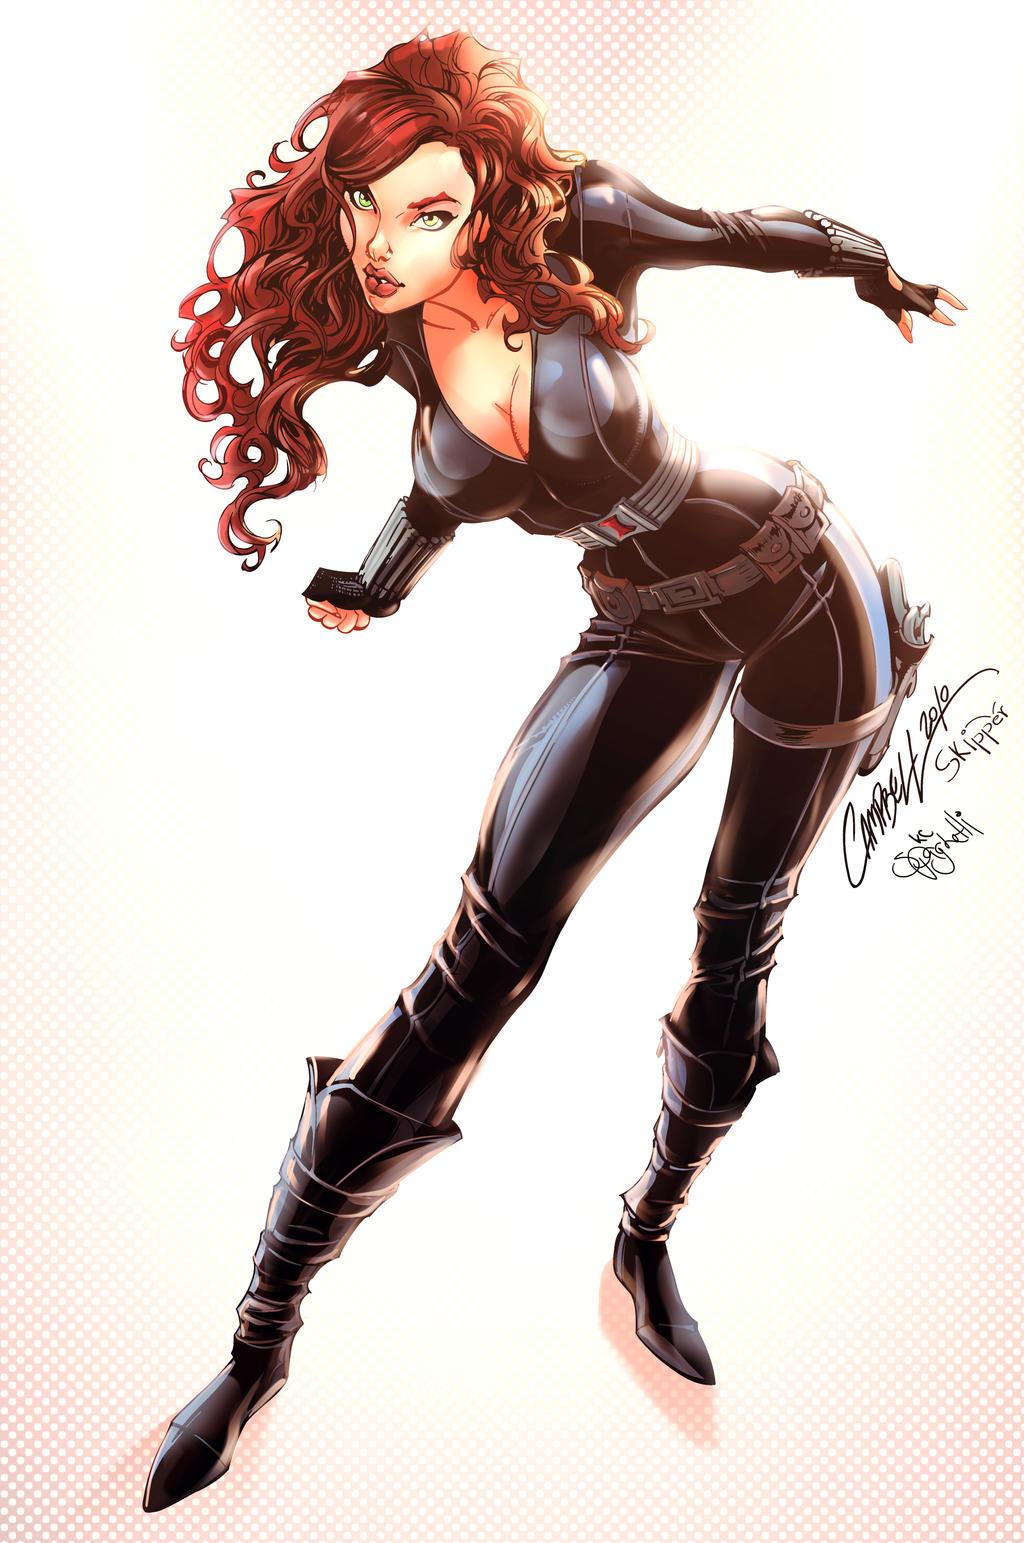 @deviantART Picks: Week of 3/02/2014 #Transformers # ... The Amazing Spider Man 3 Black Cat